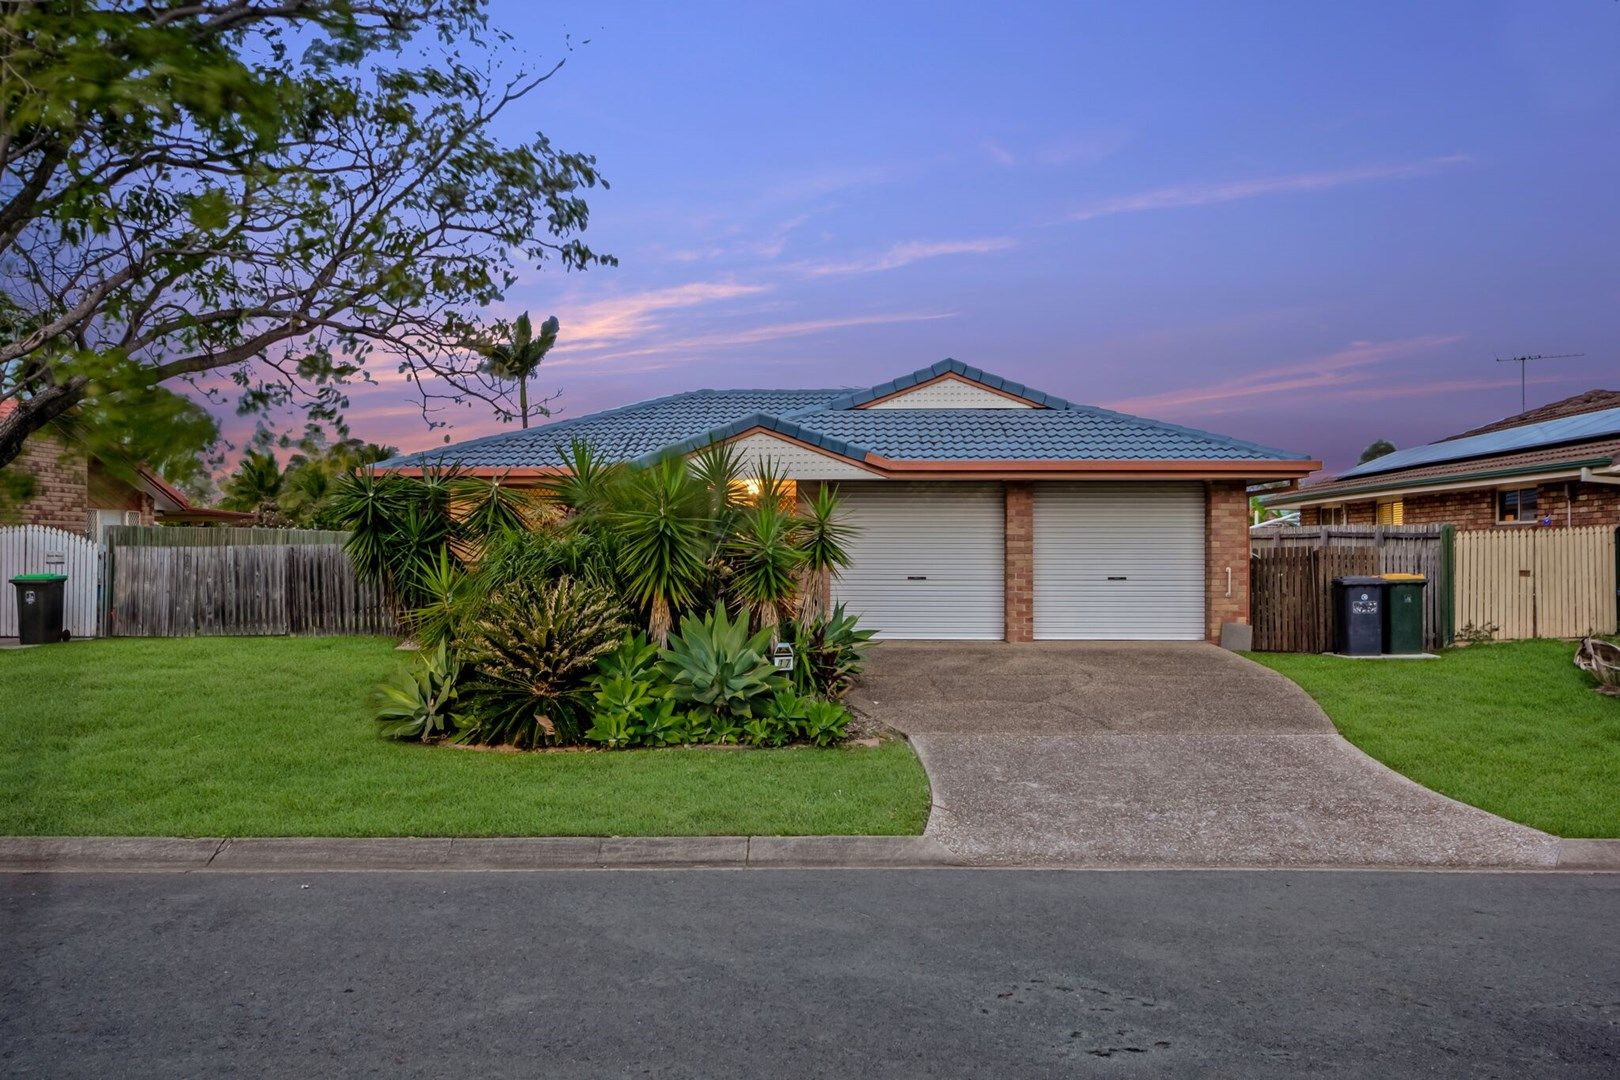 17 Allira Crescent, Carseldine QLD 4034, Image 0